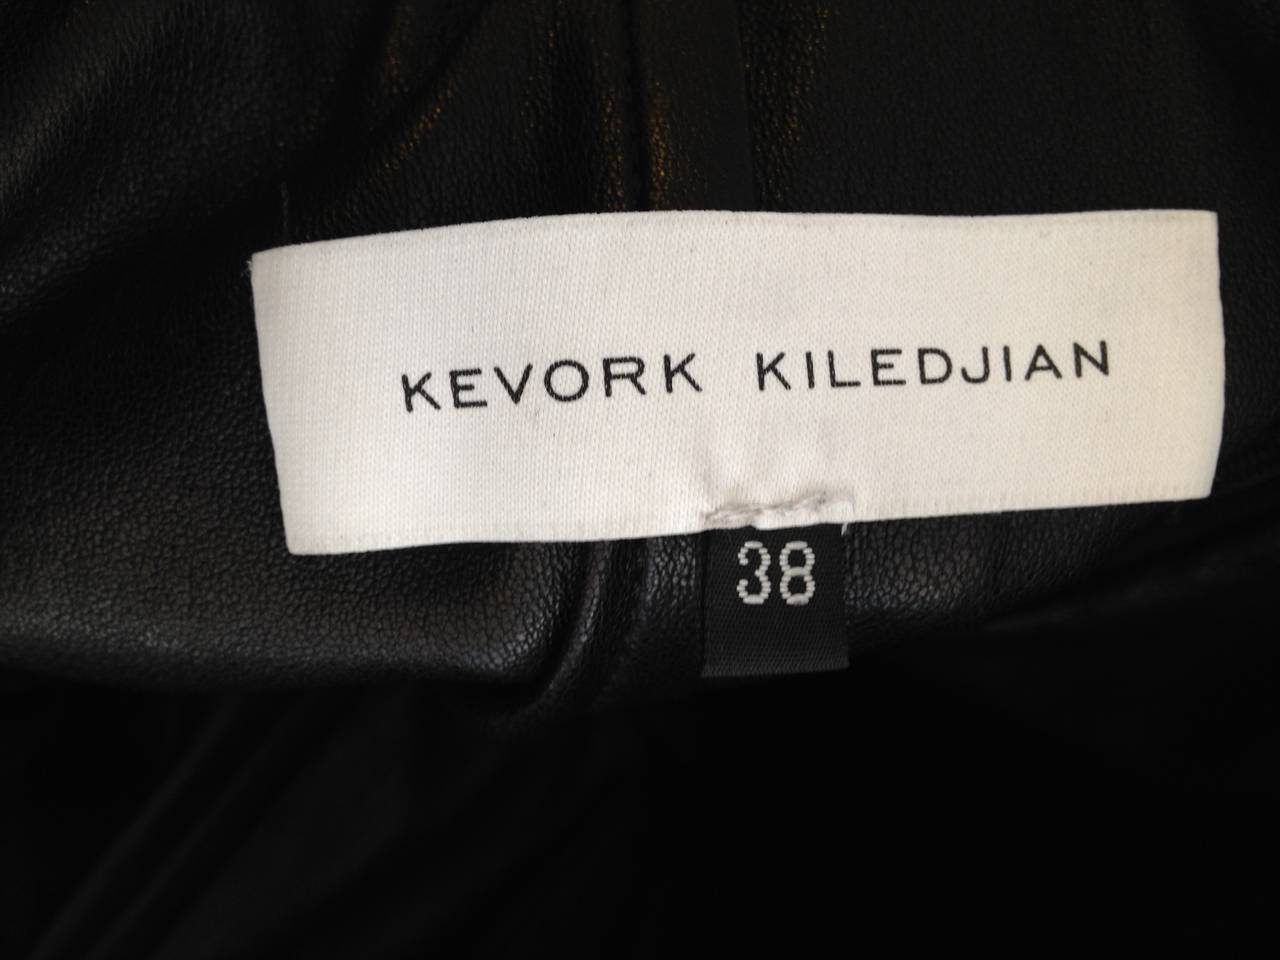 Kevork Kiledjian Black Leather and Lace Dress For Sale 4